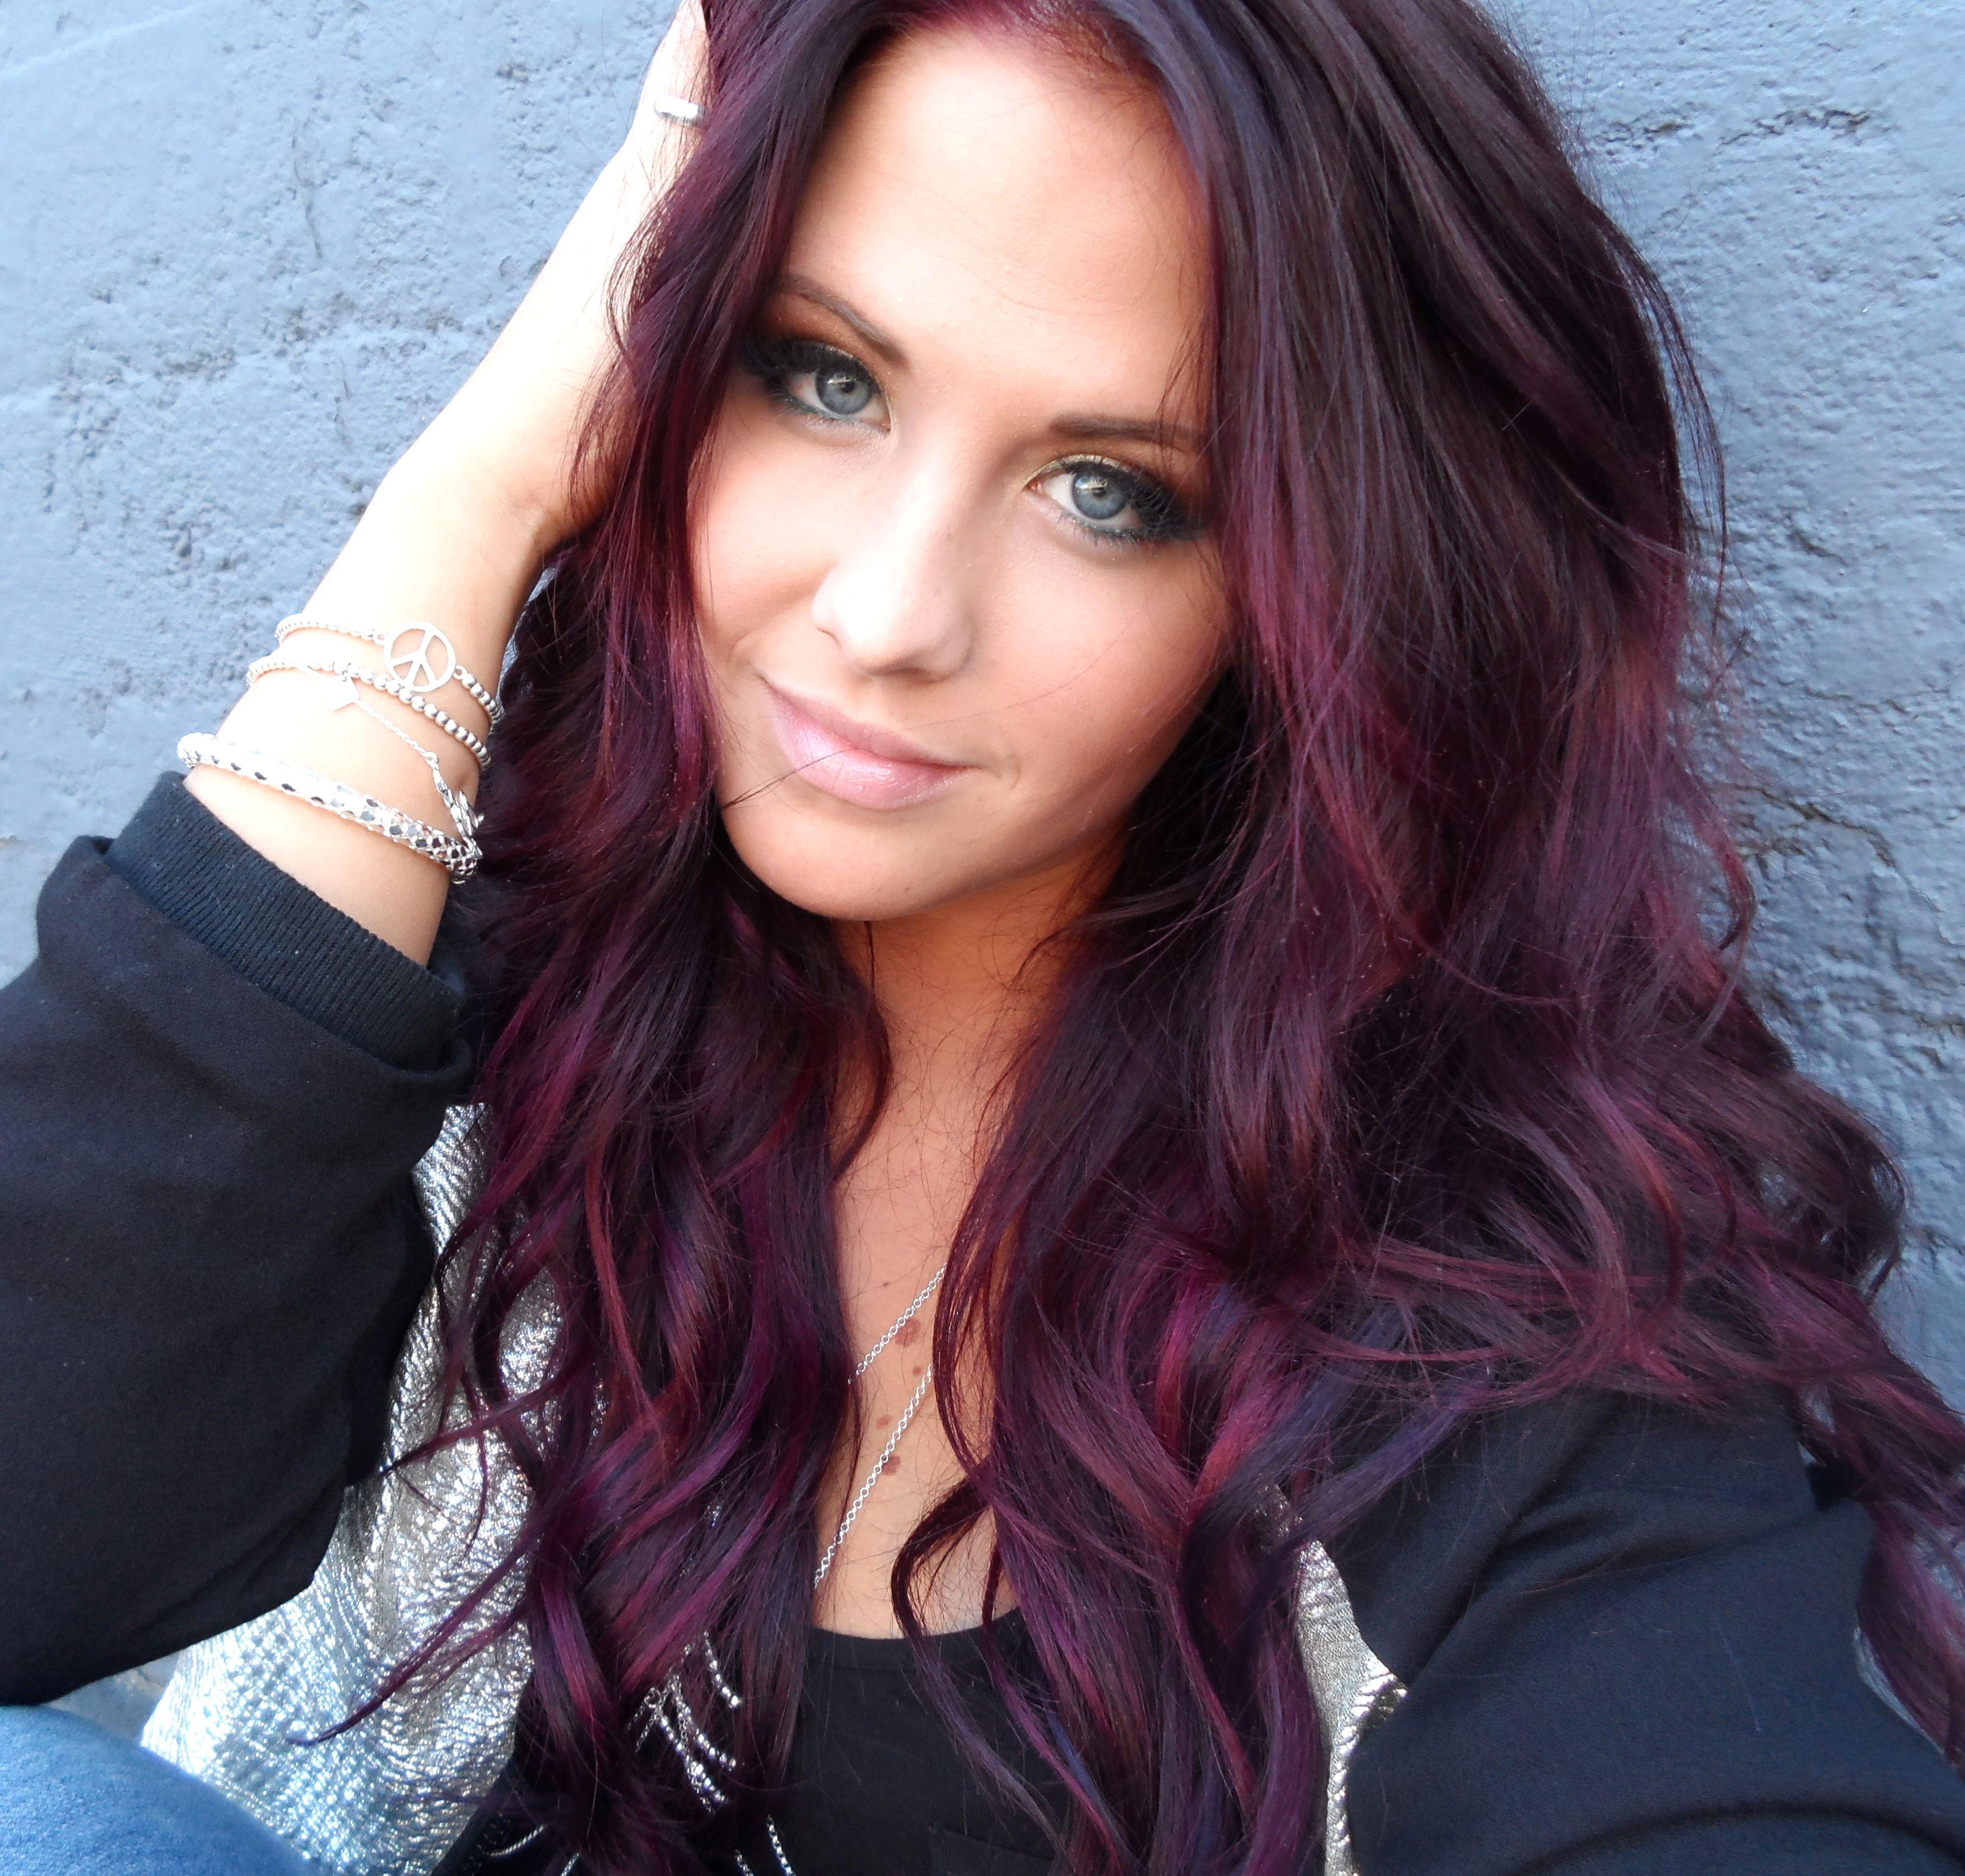 Molly Sandén, Swedish singer, born 1992.